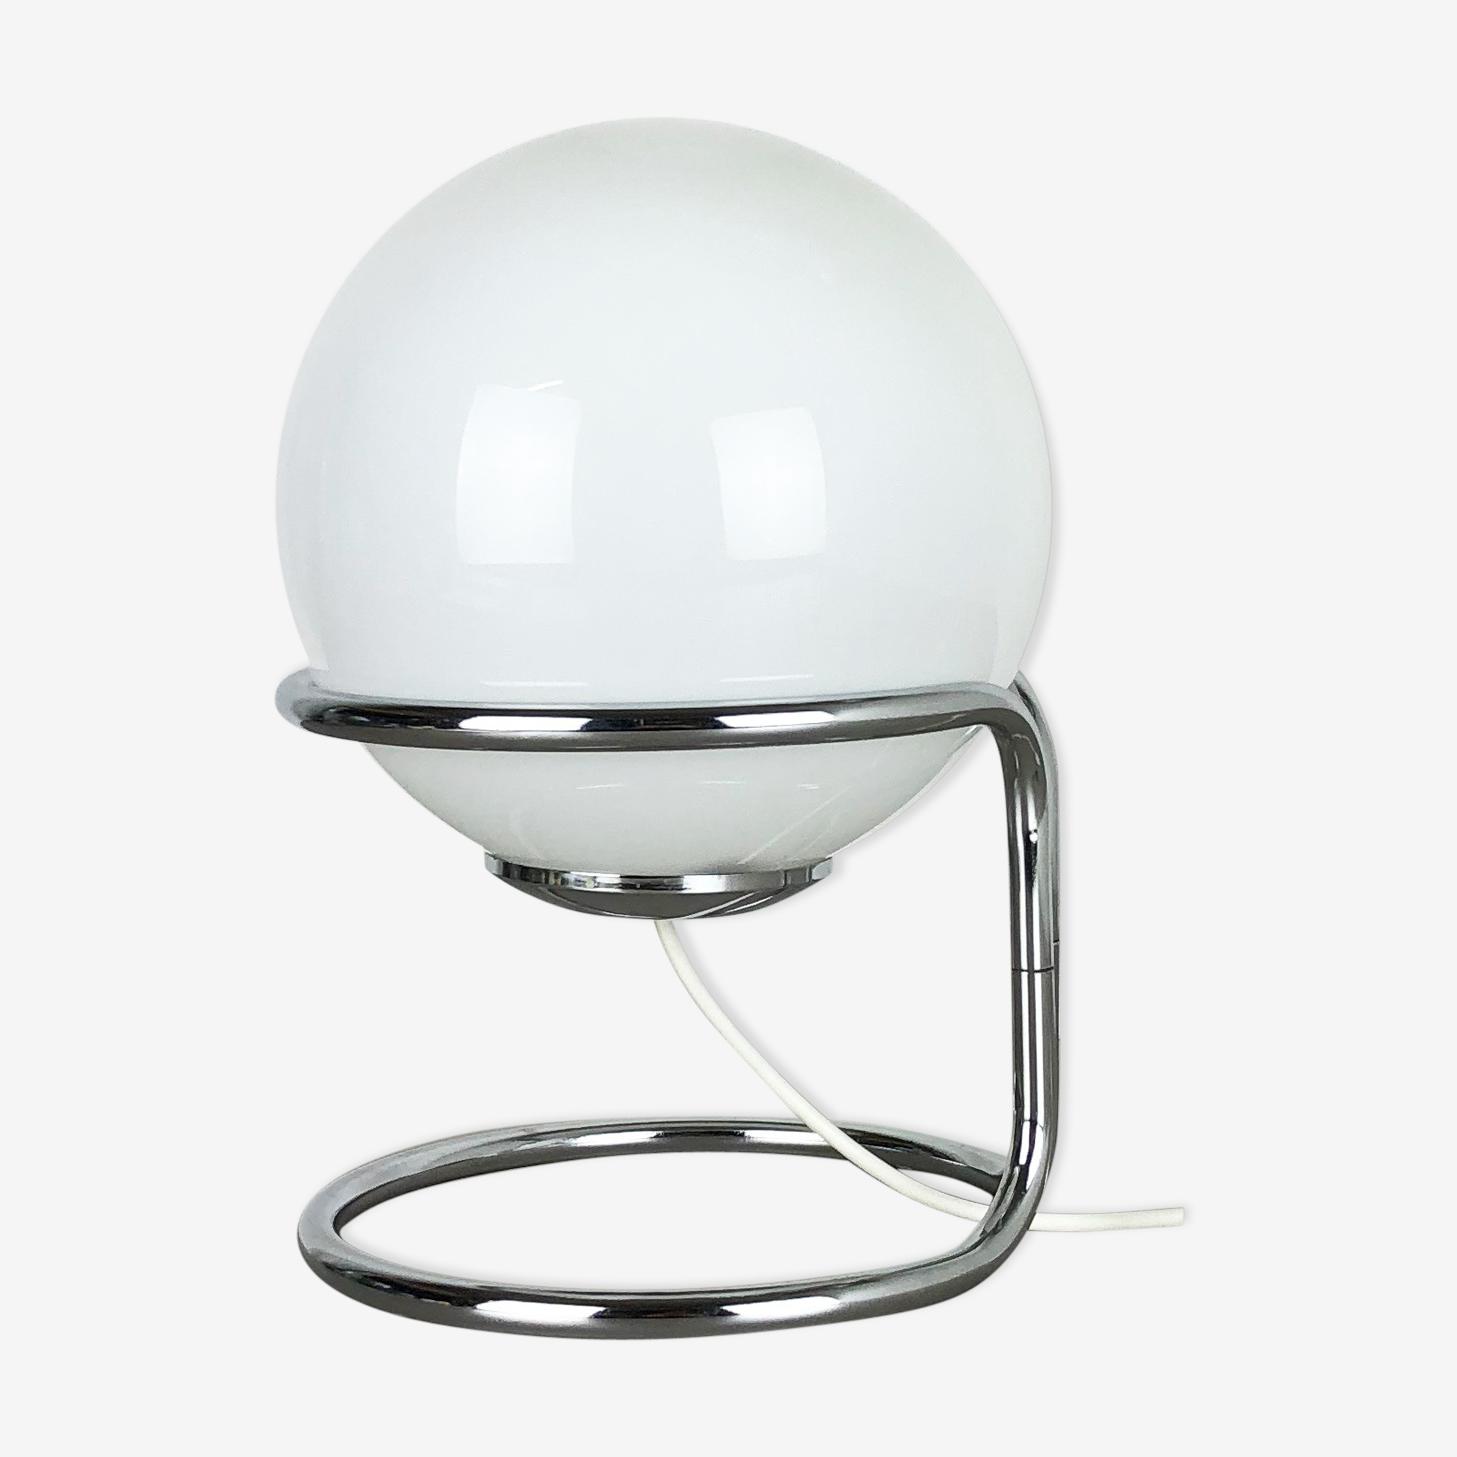 Sputnik table lamp by Honsel lights, 1970